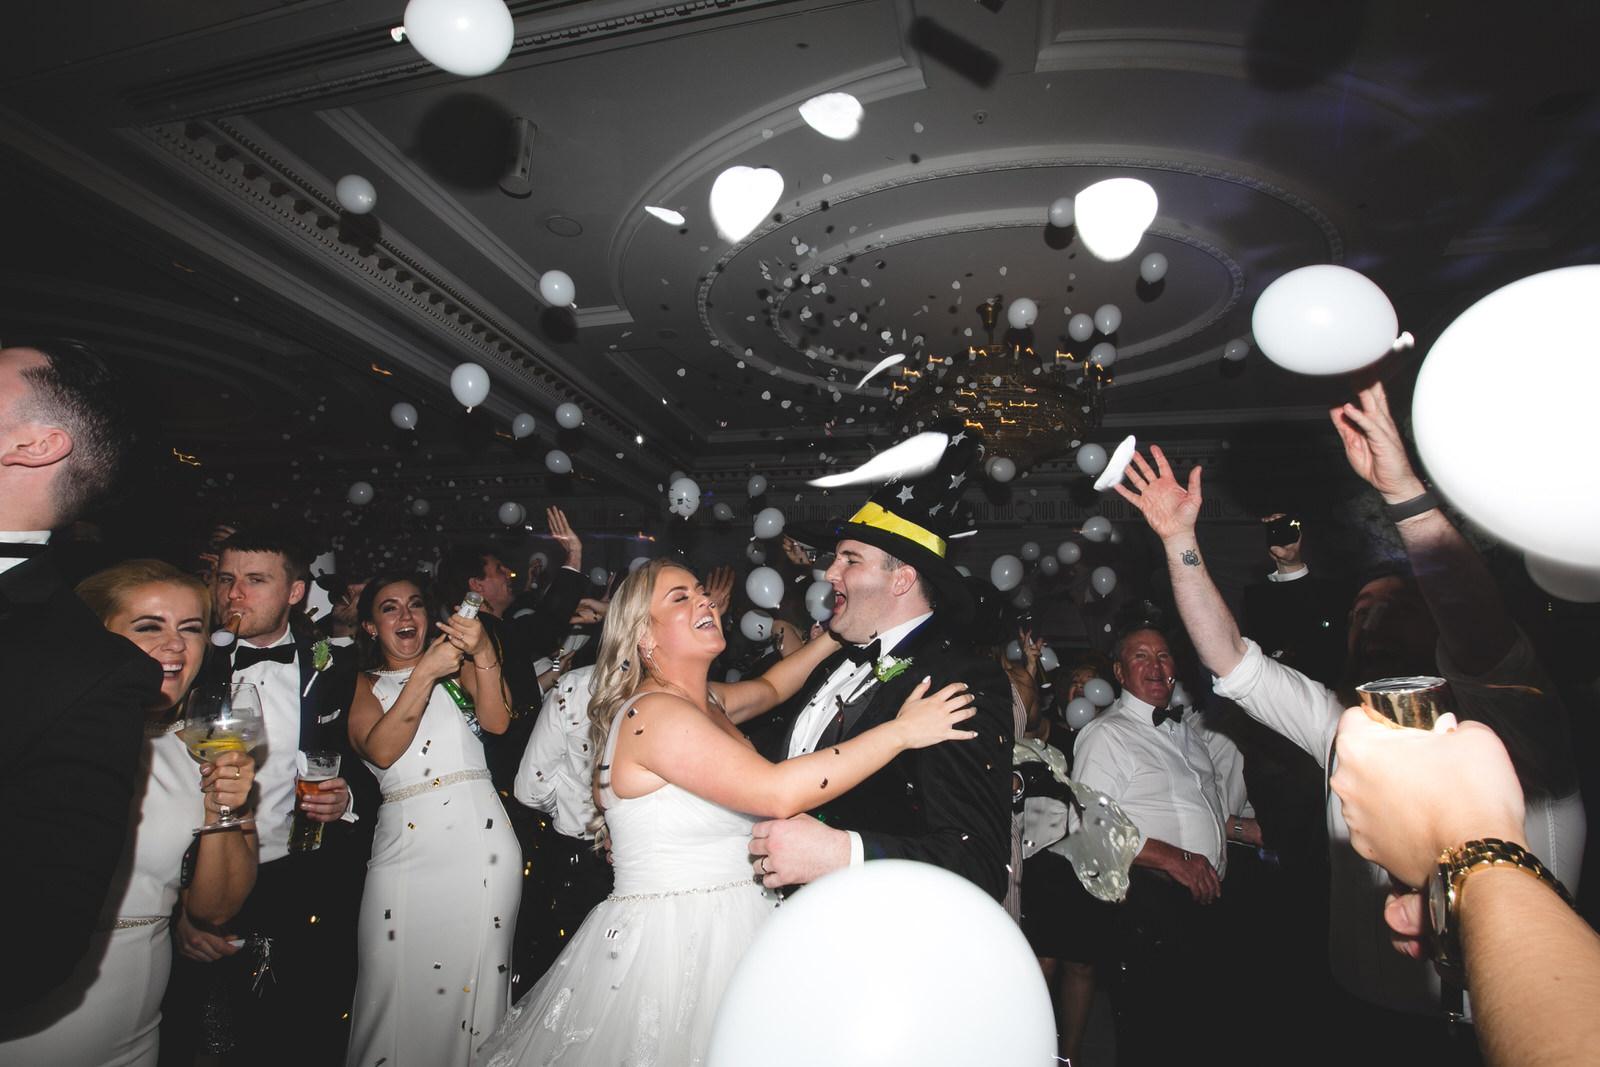 new years eve wedding confetti & balloon drop at Powerscourt Hotel